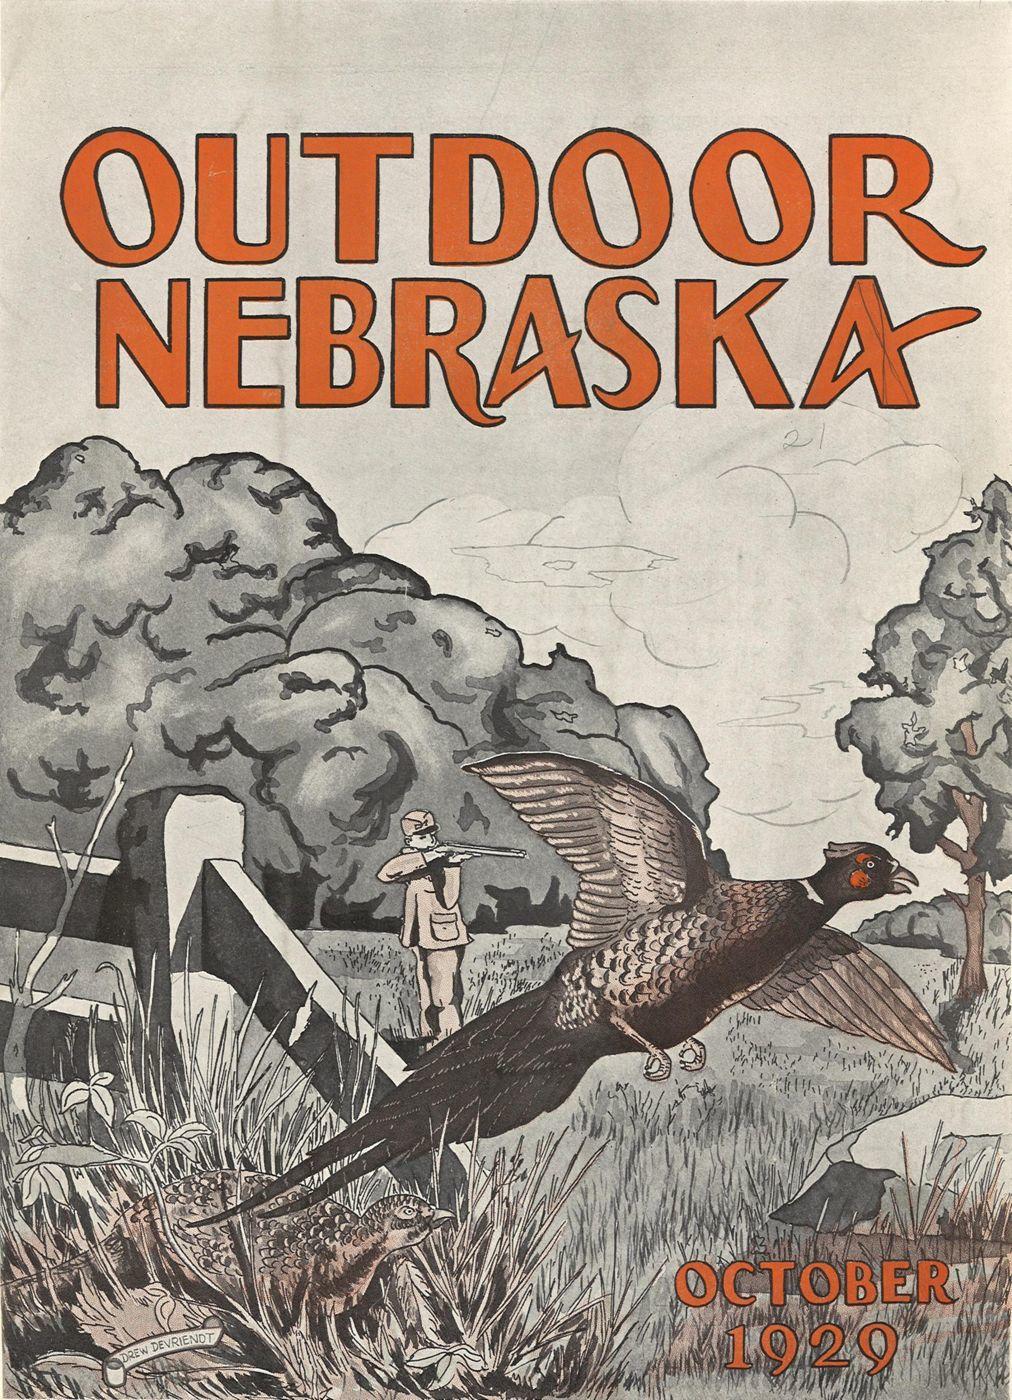 October 1929: Nebraskaland digital archive